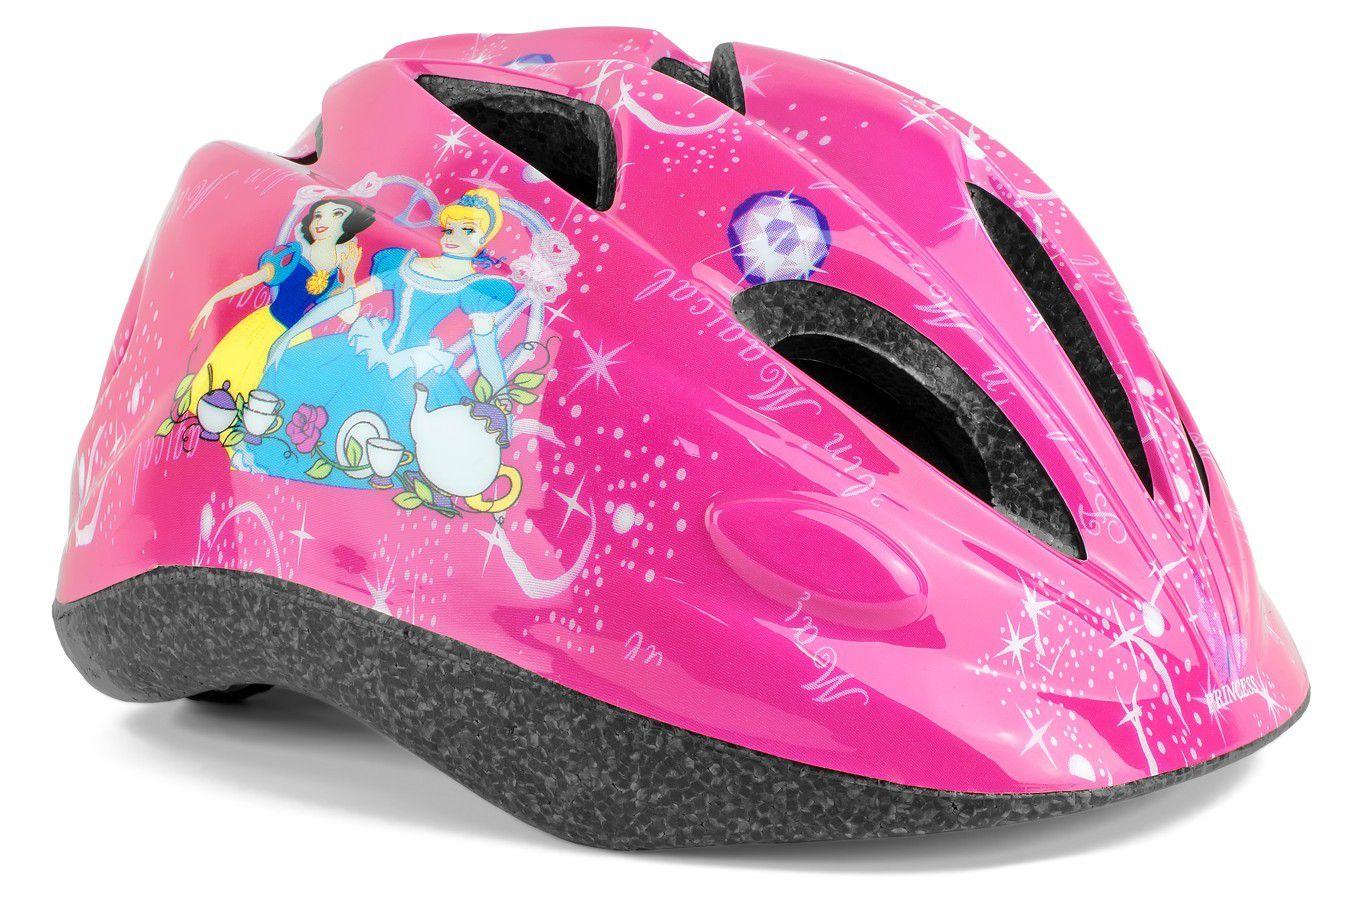 Capacete Infantil Princesas Branca de Neve com Regulagem Patins Bike Skate